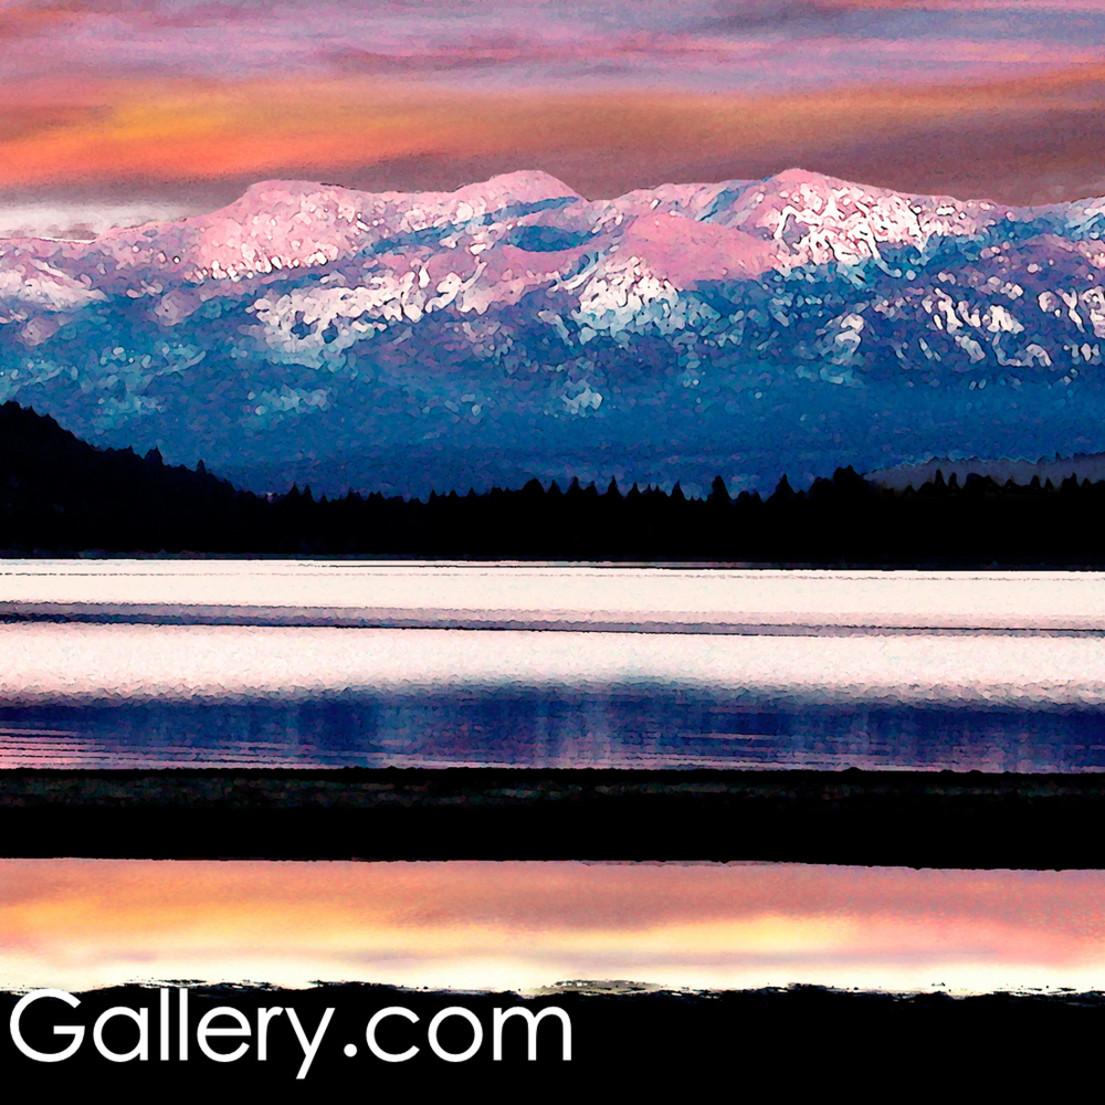 Winter solitude donner lake ws9k47